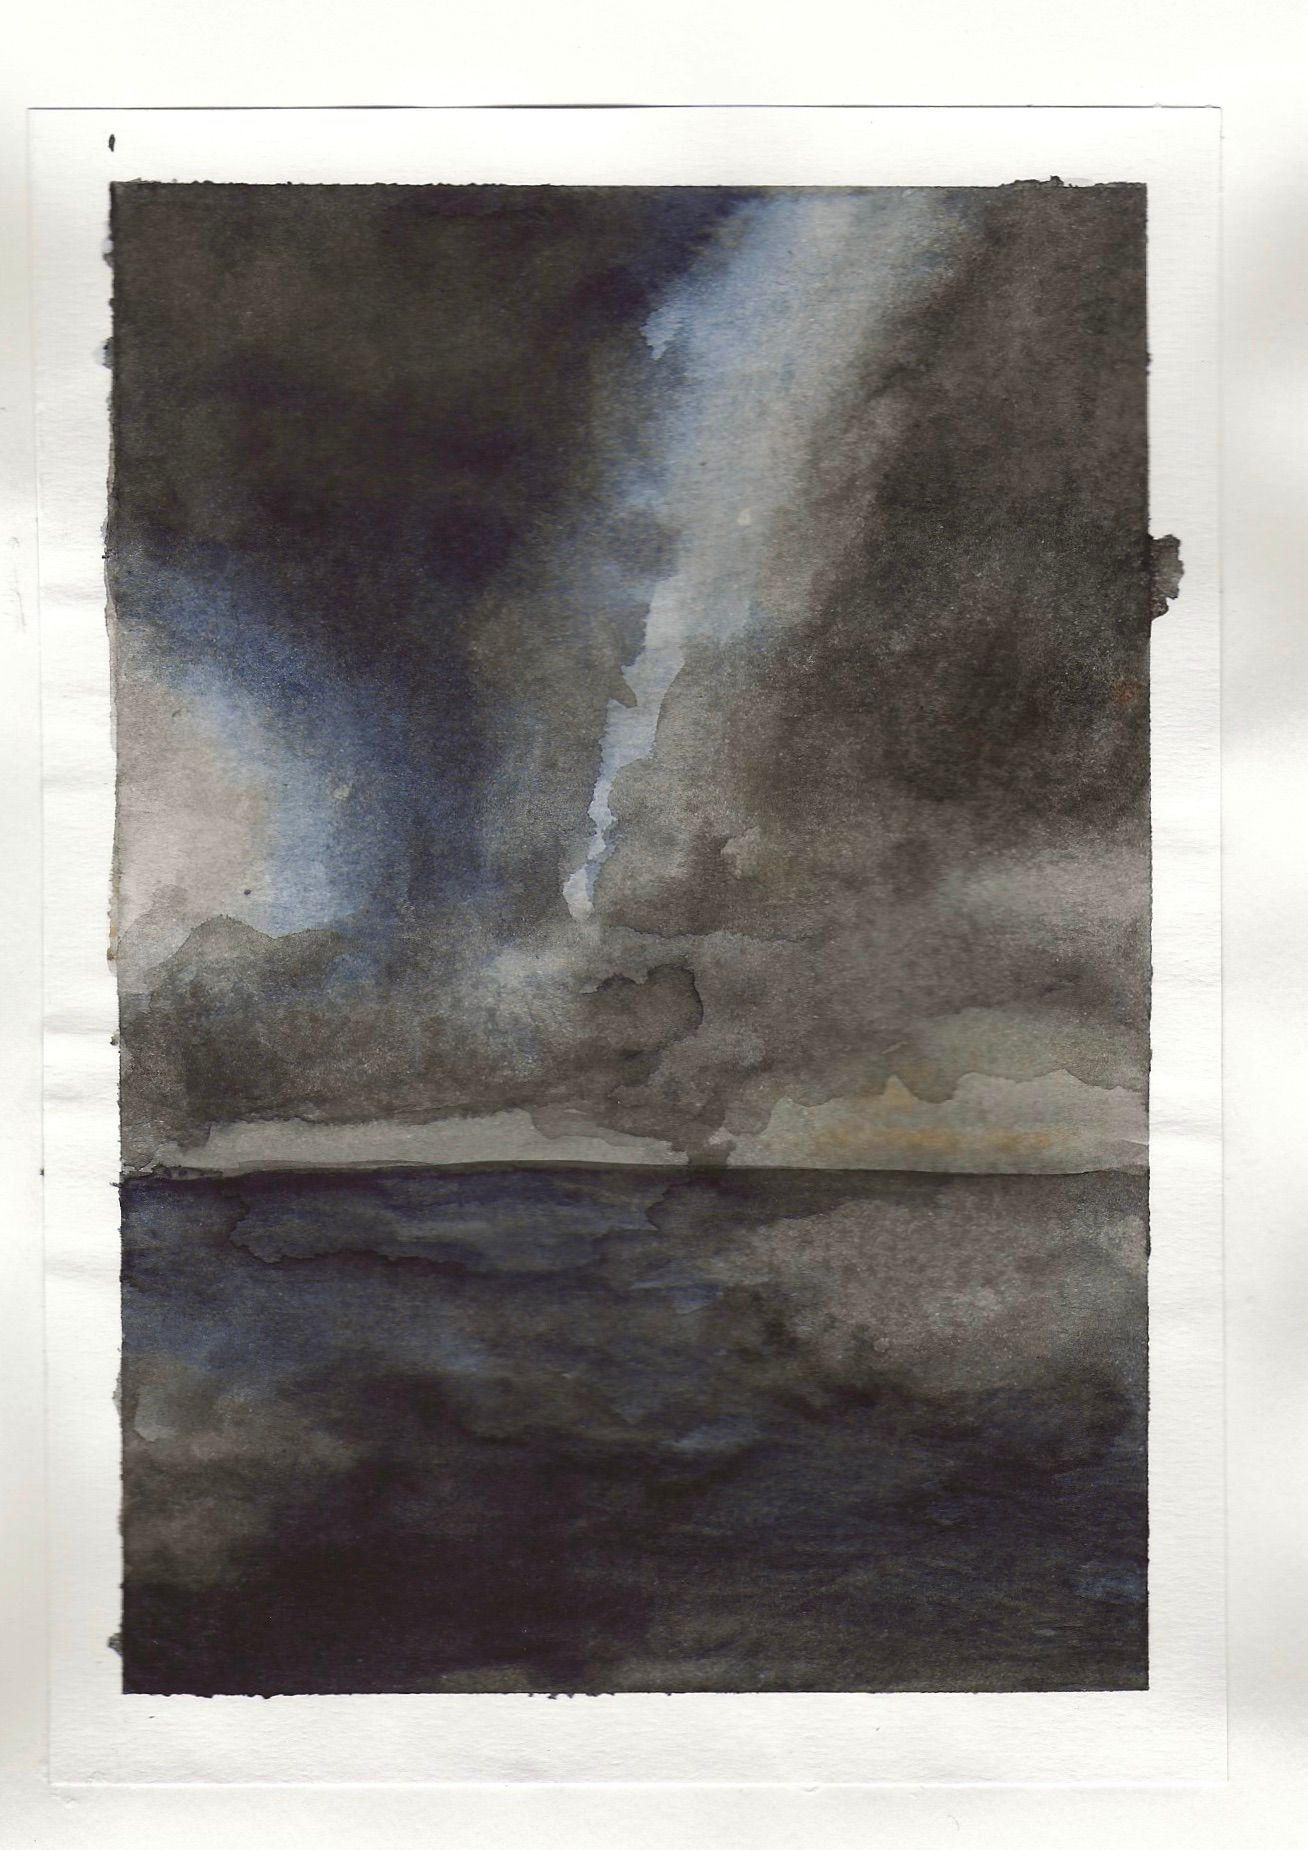 watercolour studies - sequence 1 - #3 - watercolour - 148 x 210mm - 200gsm 120lb